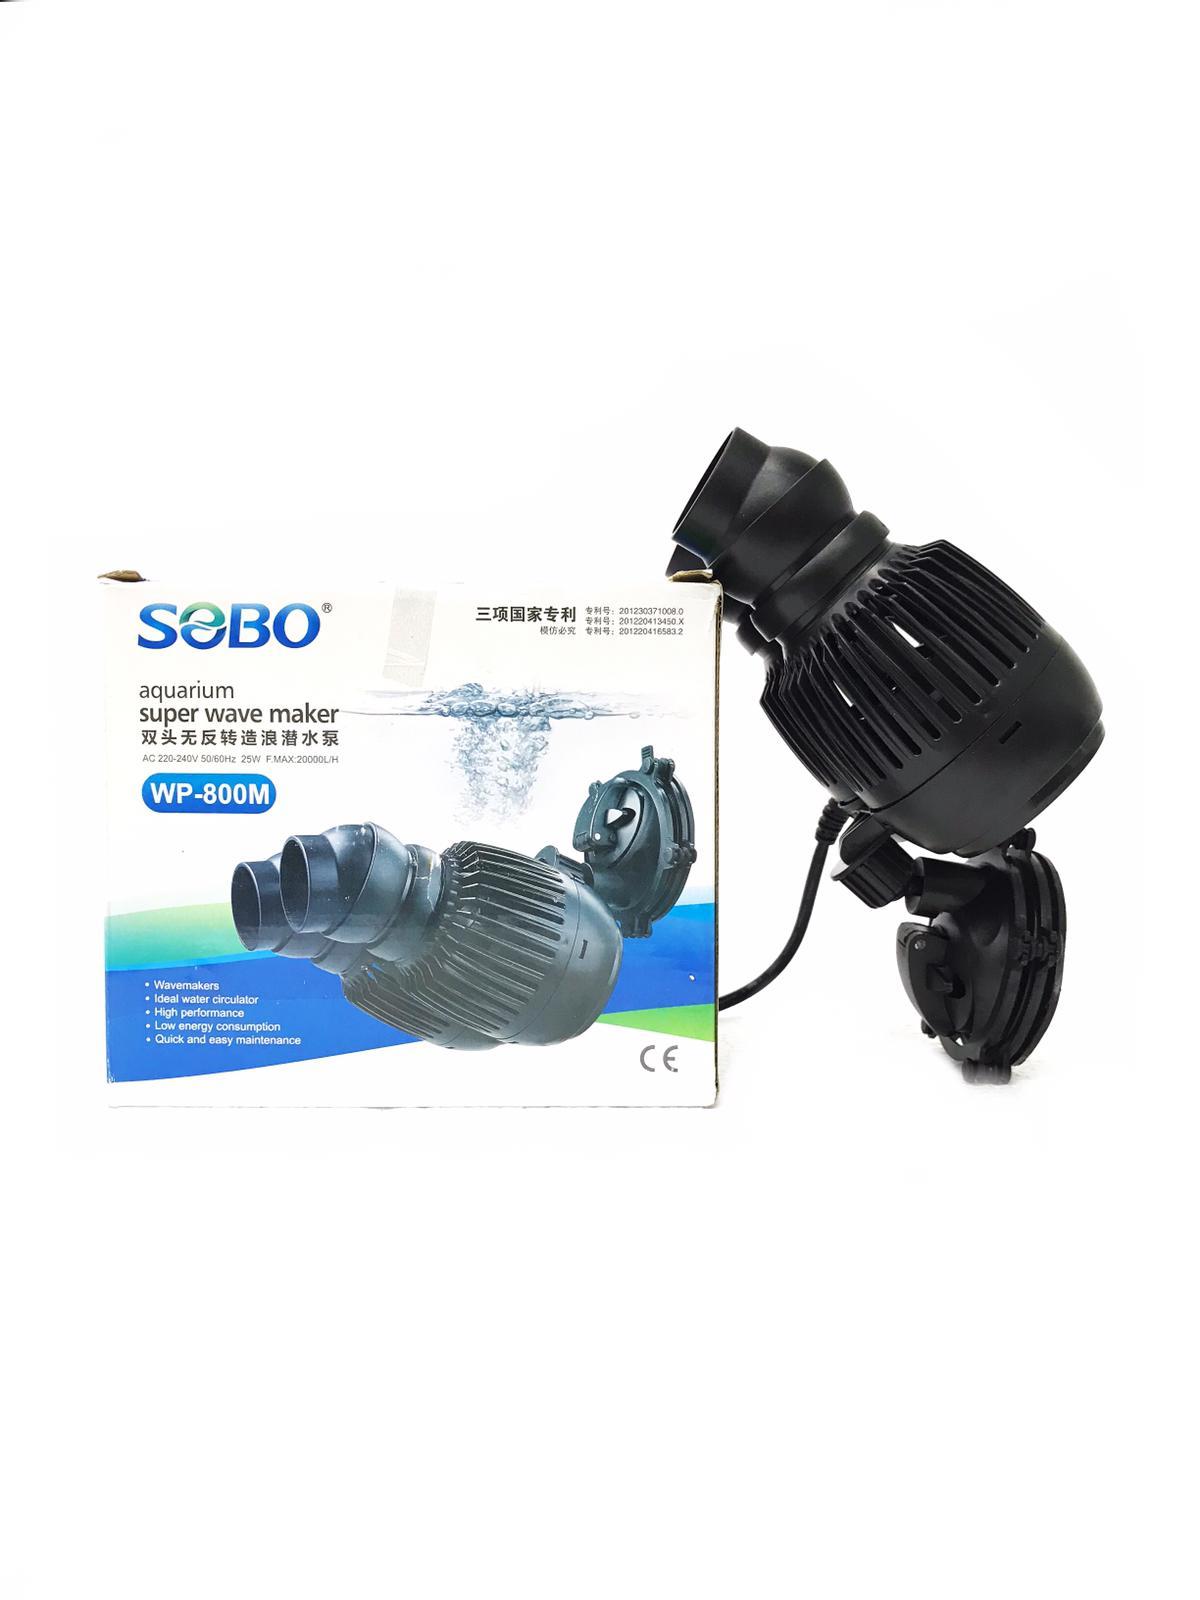 Sobo Super Wave Maker (Double Outlet)